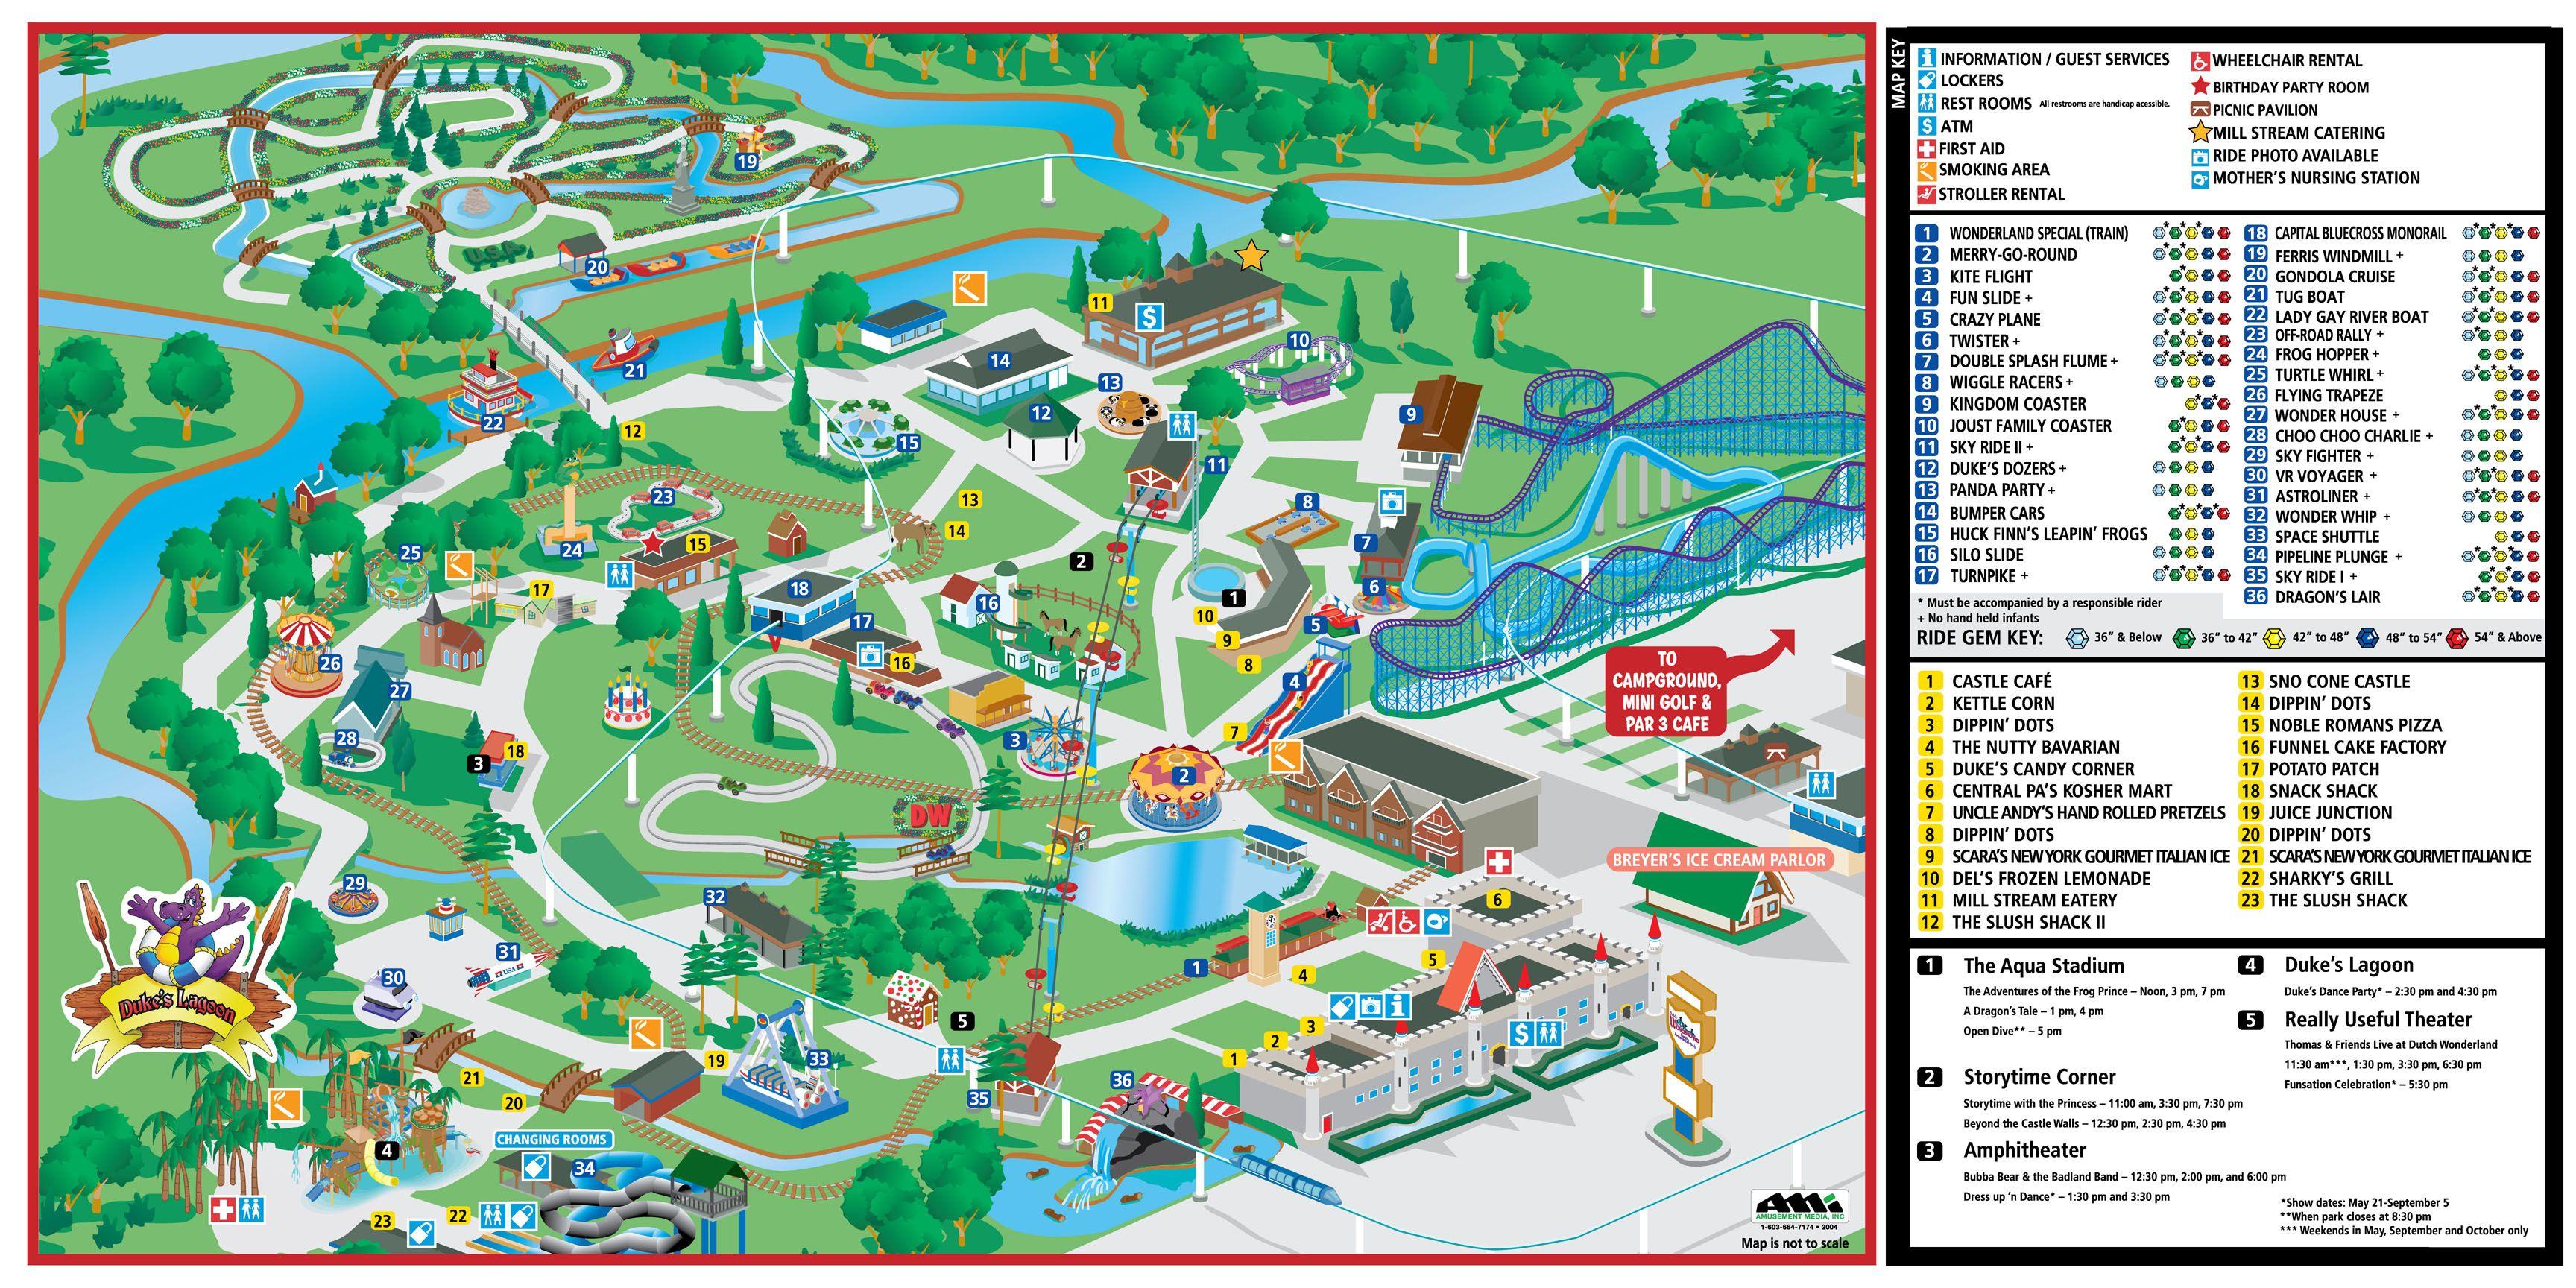 Mill Hall Pa >> Dutch Wonderland - Park Map | Lancaster | Wonderland park, Wonderland, Dutch